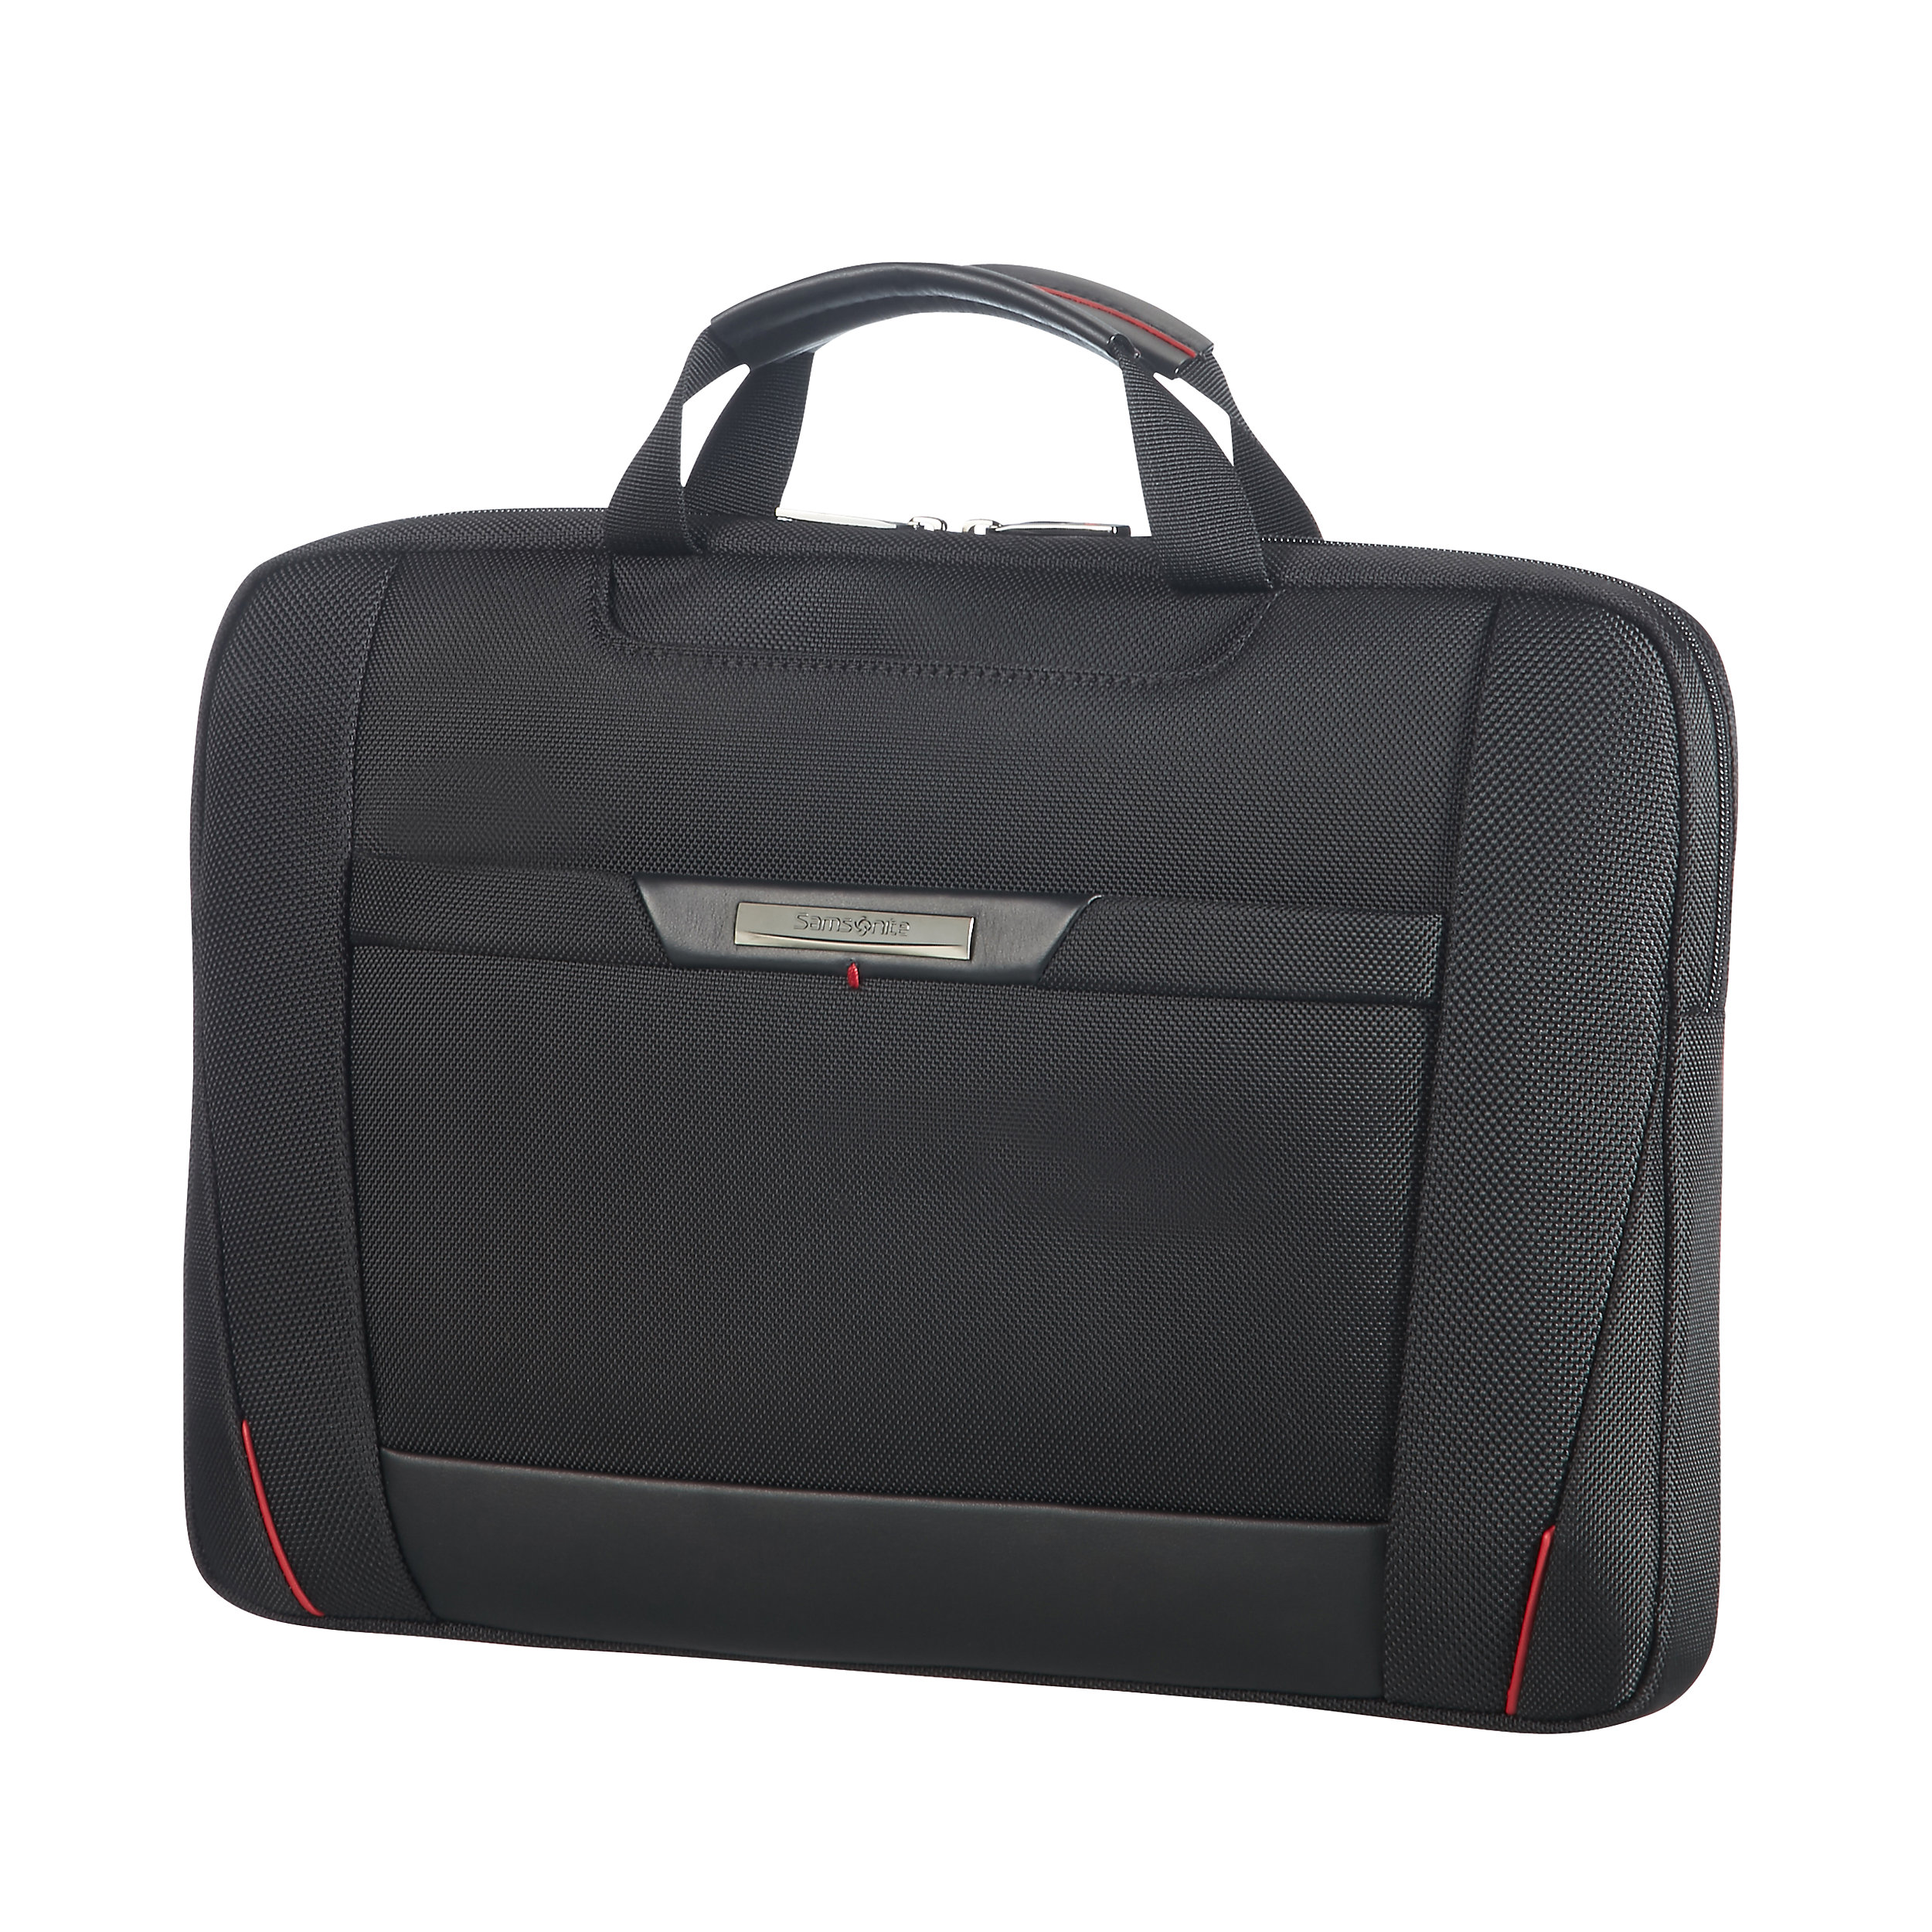 "Laptop Sleeve 15,6"" RFID Pro-DLX5 8.5 Liter"